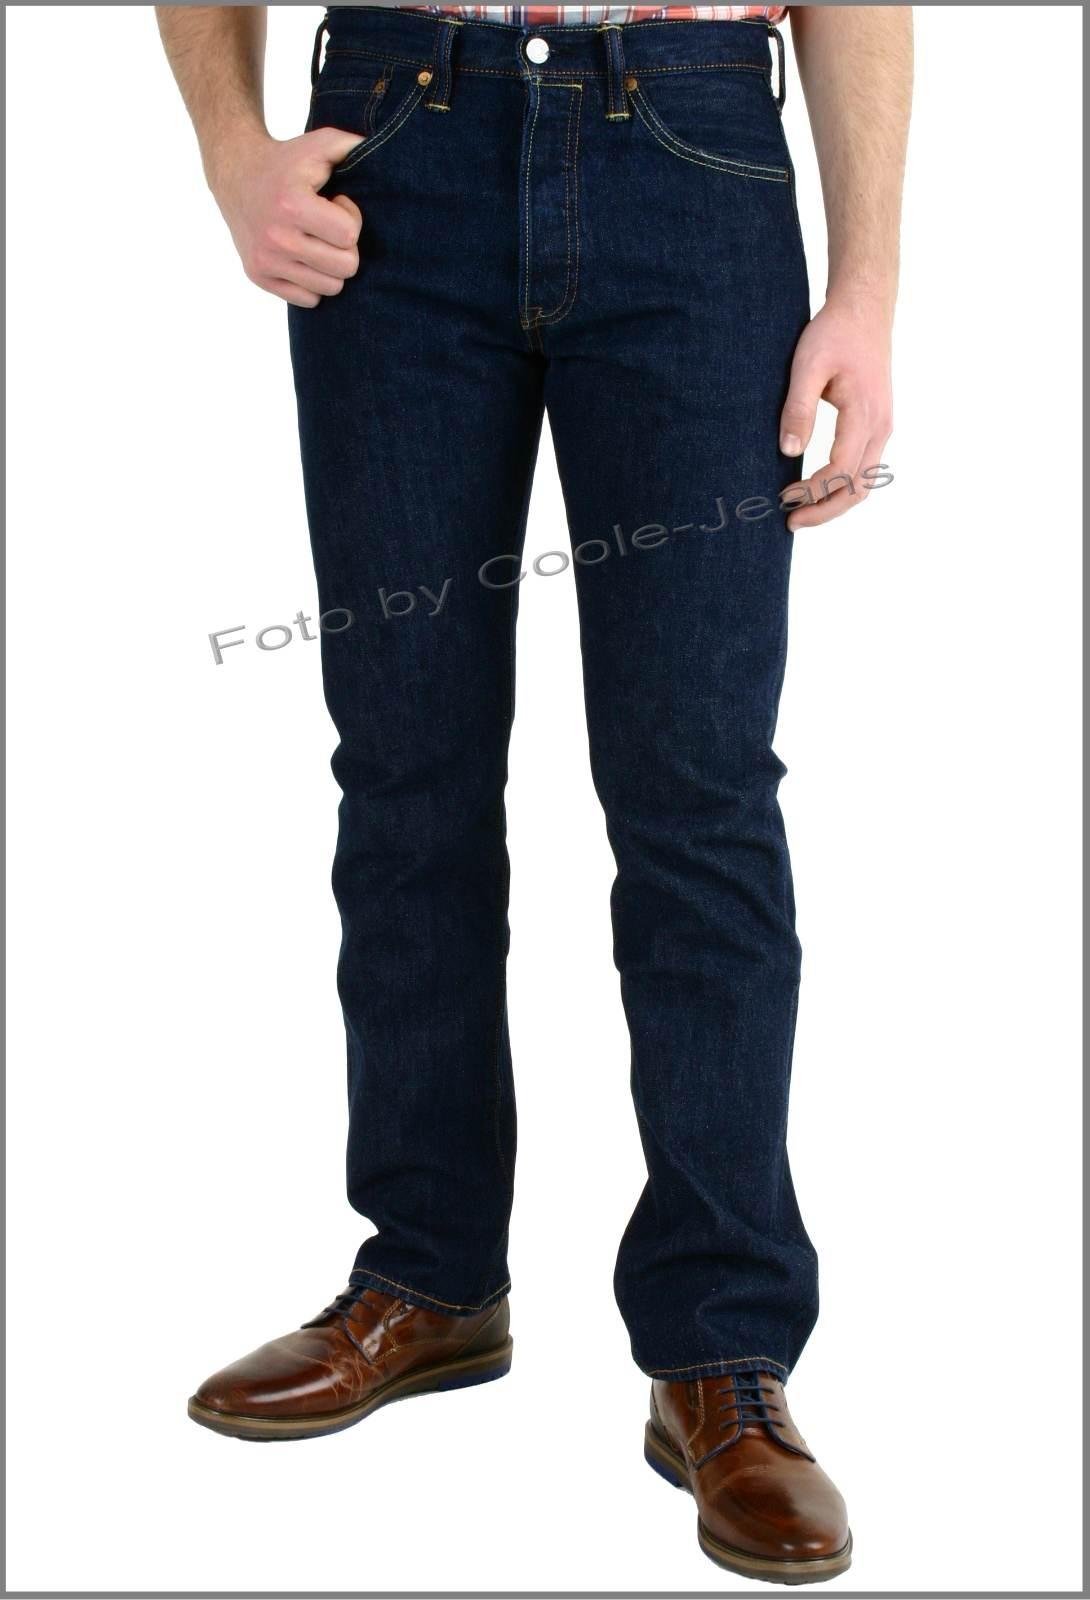 levi s herren jeans 501 original straight fit w34 l34 blau one wash 0101. Black Bedroom Furniture Sets. Home Design Ideas